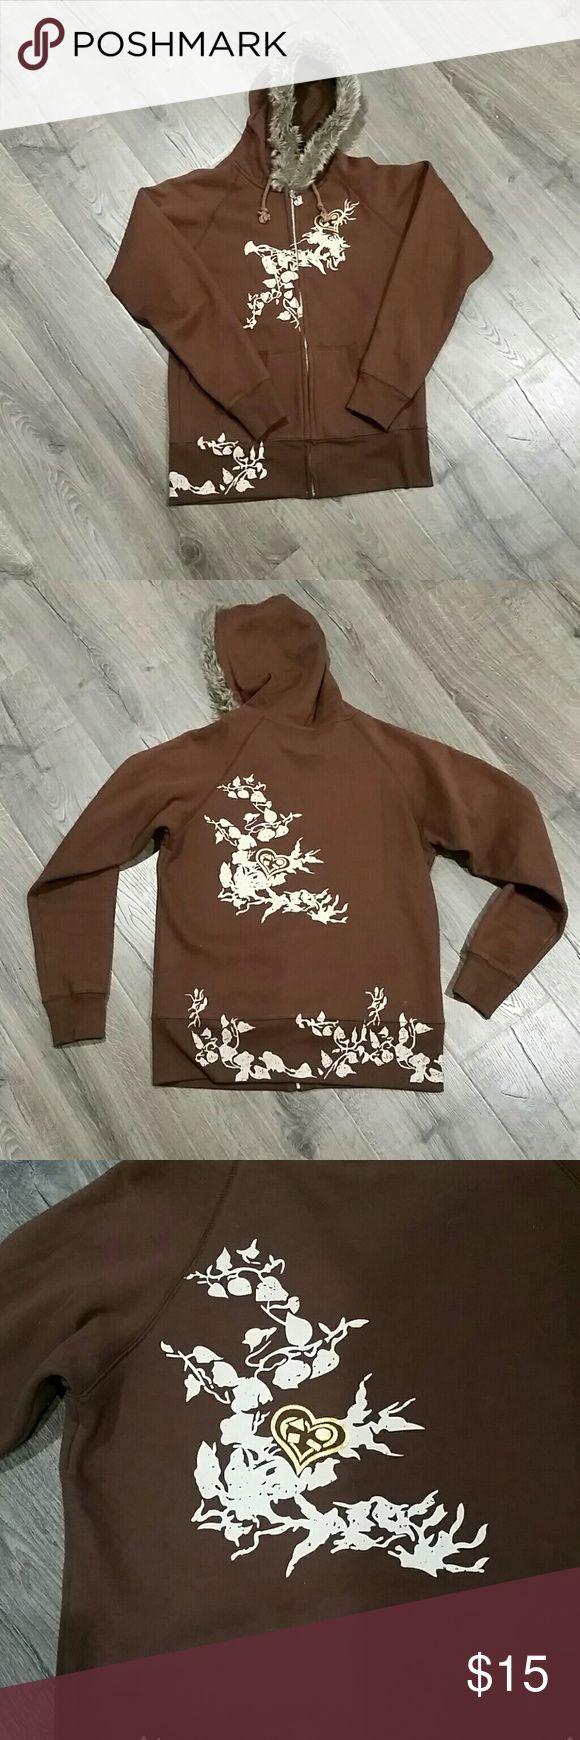 Fur hooded zip up sweatshirt Brown zip up hooded sweatshirt with fur trimmed hood. Foilage pattern on front and back with gold heart detail. maui girl Tops Sweatshirts & Hoodies